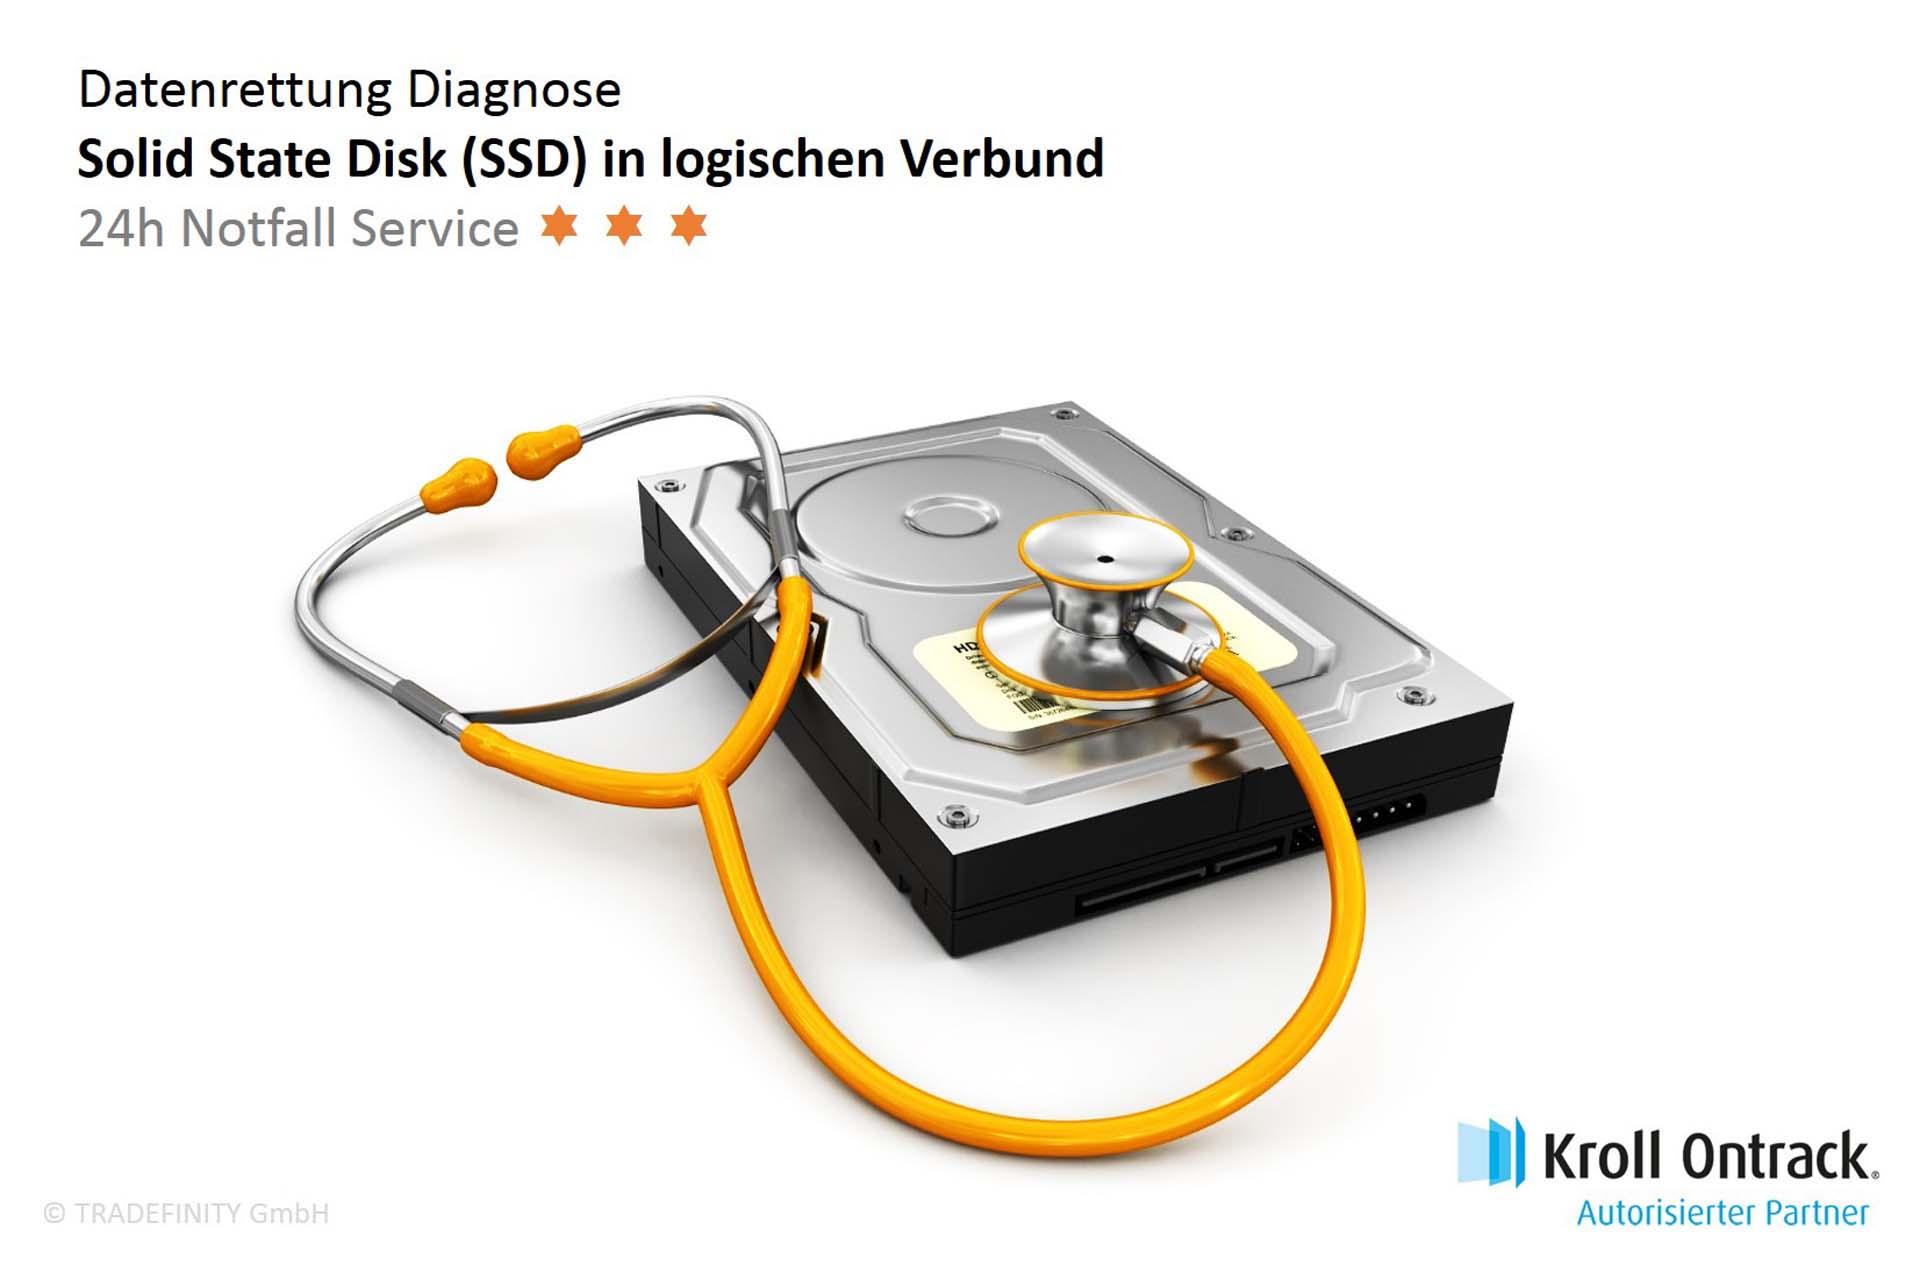 Datenrettung Diagnose (24h Notfall Service) von SSD (Verbund)